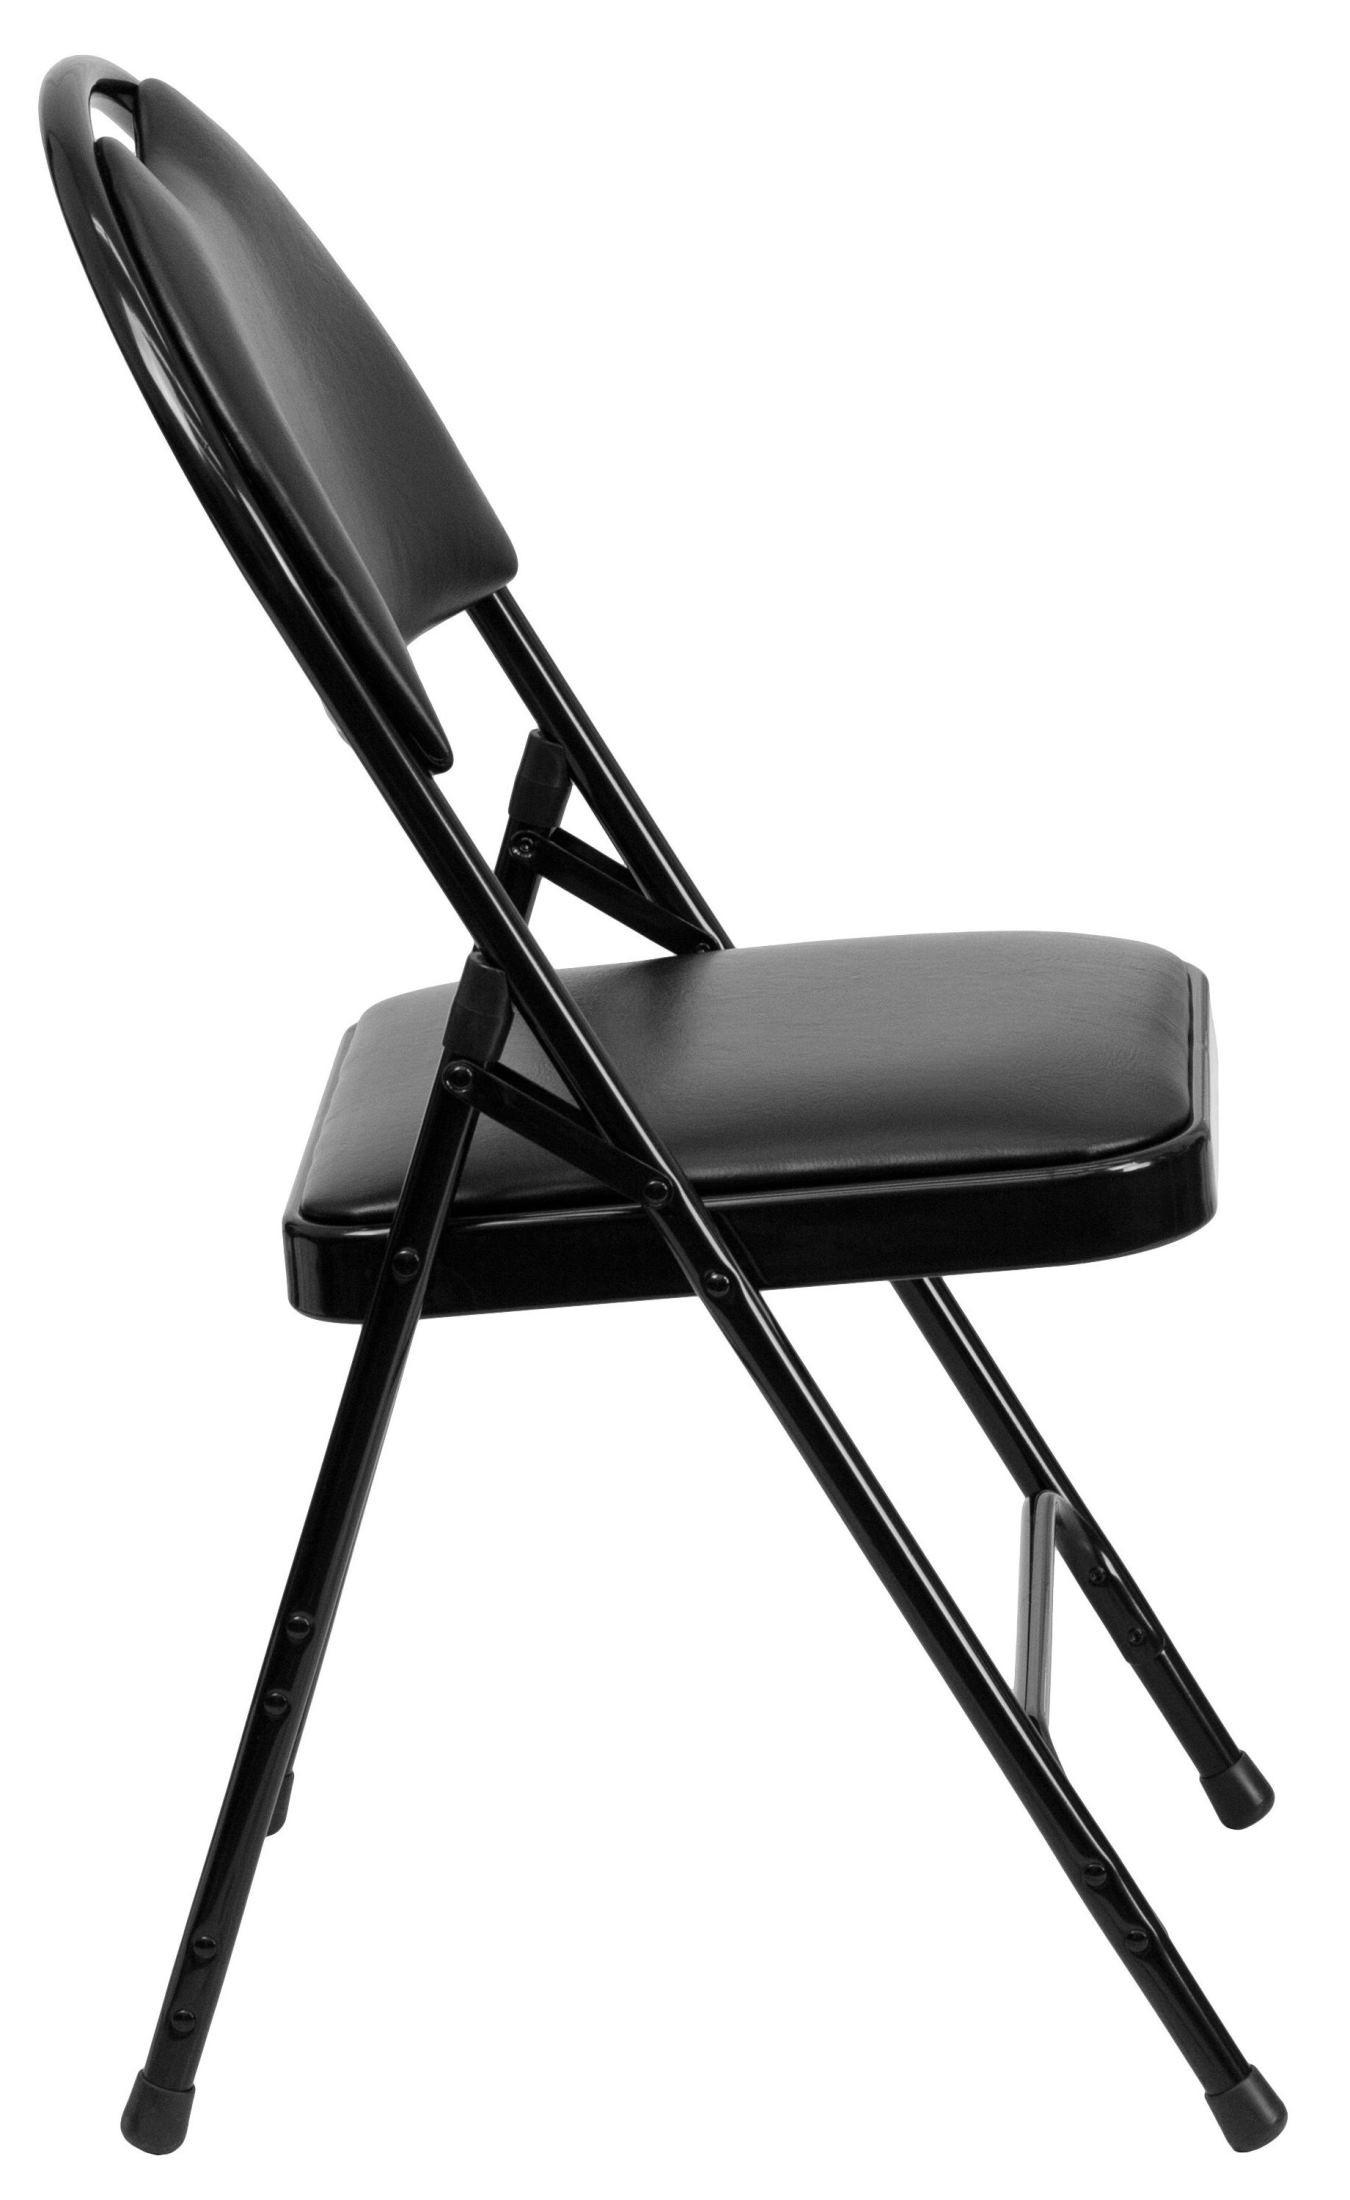 hercules folding chair white garden series ultra premium black vinyl metal